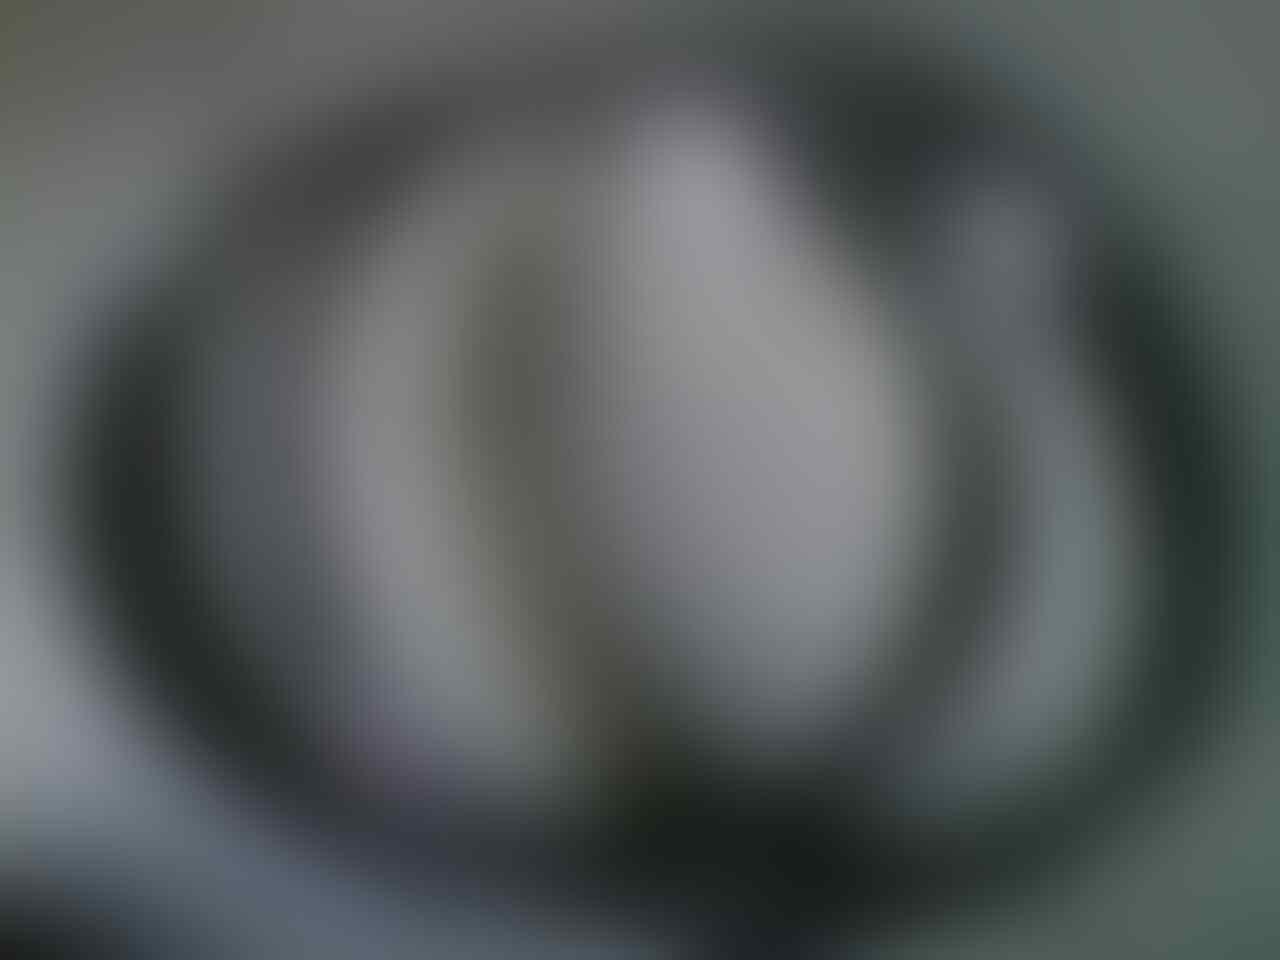 jual pelek ruji mega pro ori copotan dan lampu RX-KING variasi full crom